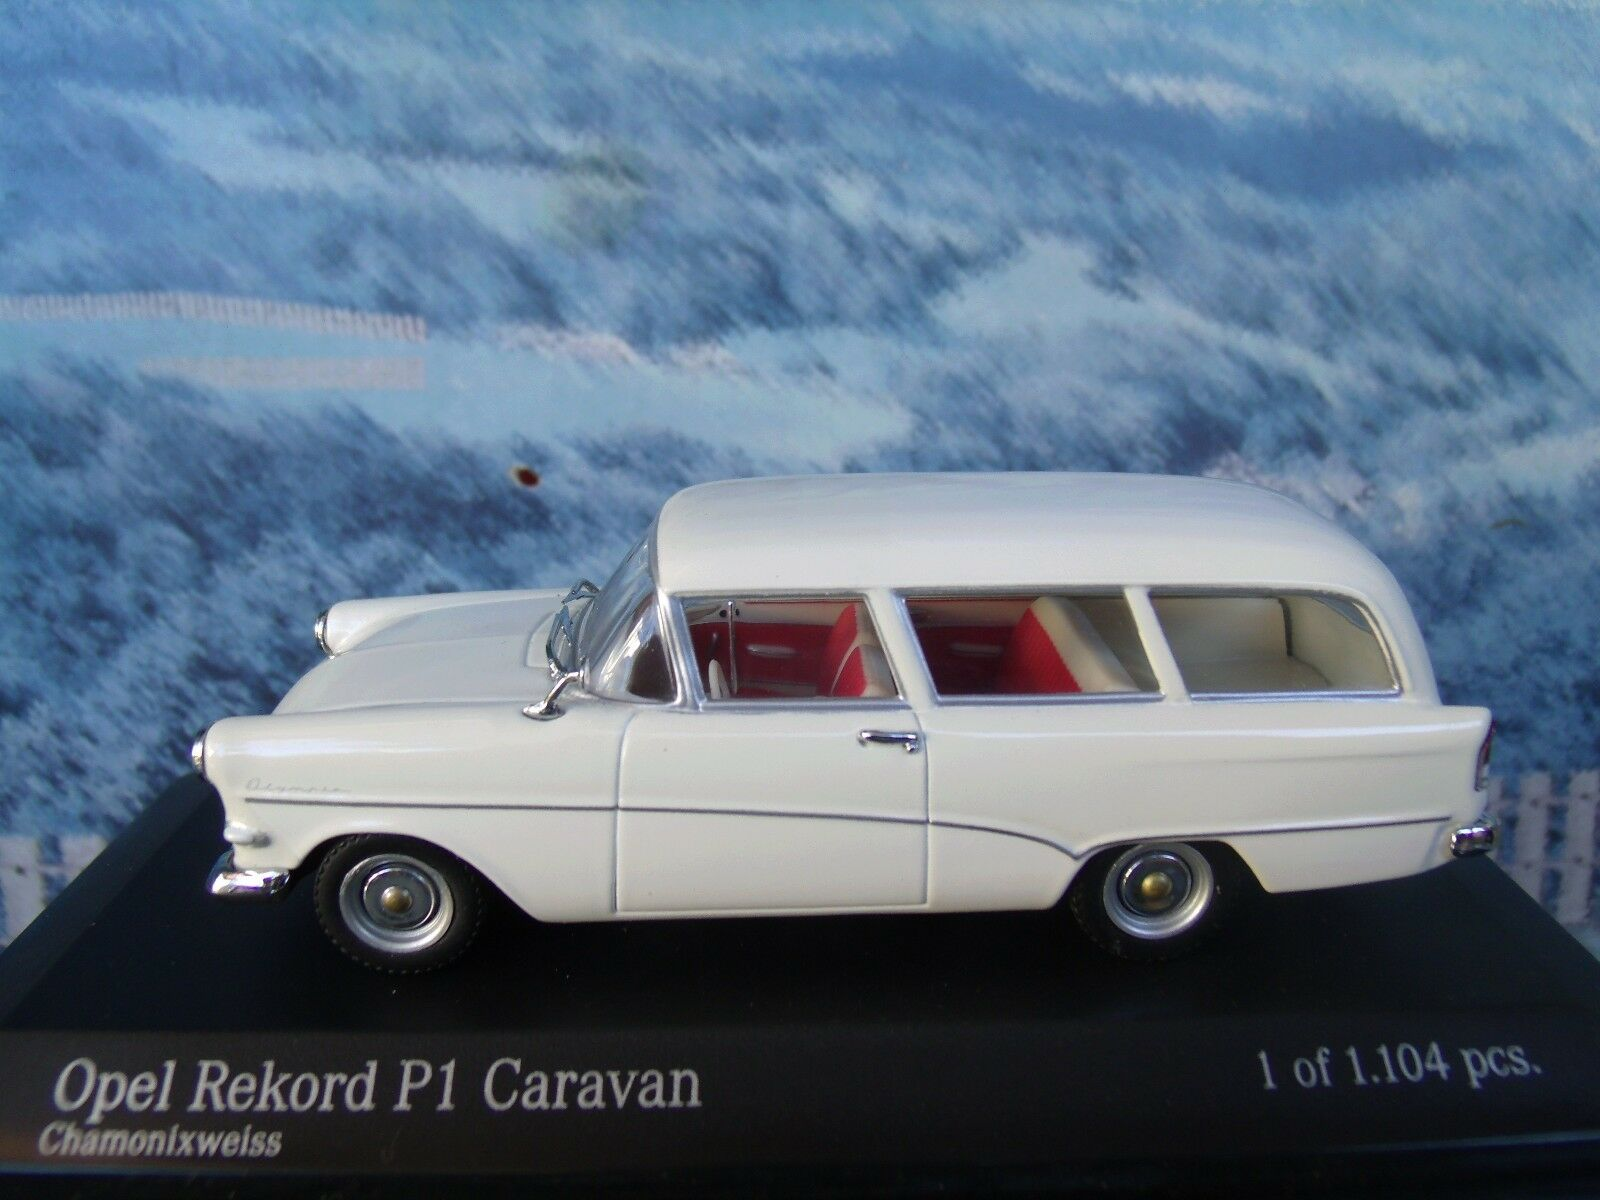 1 43  Minichamps Opel Record P1 Caravan 1958-60  1 of 1104